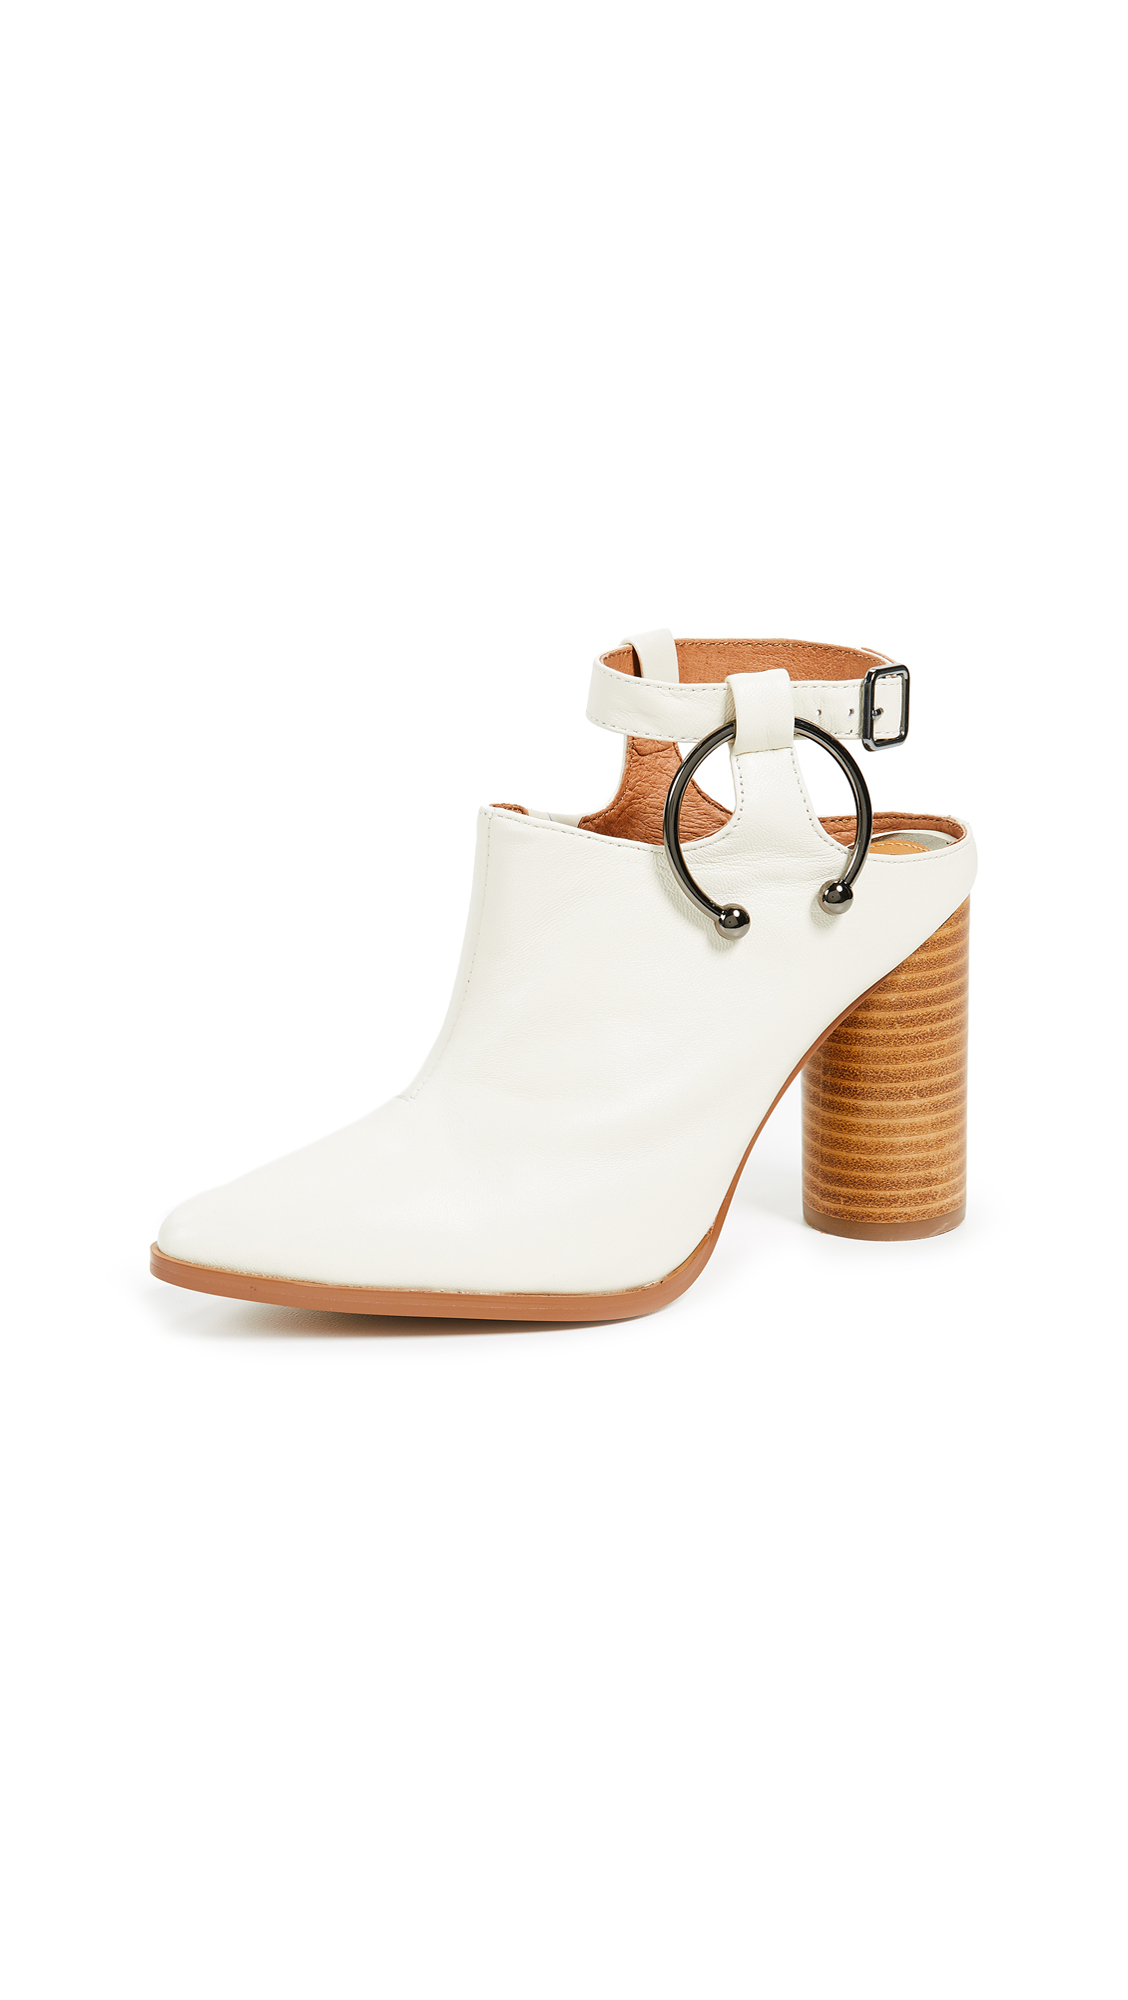 JAGGAR Diverge Block Heel Booties - White